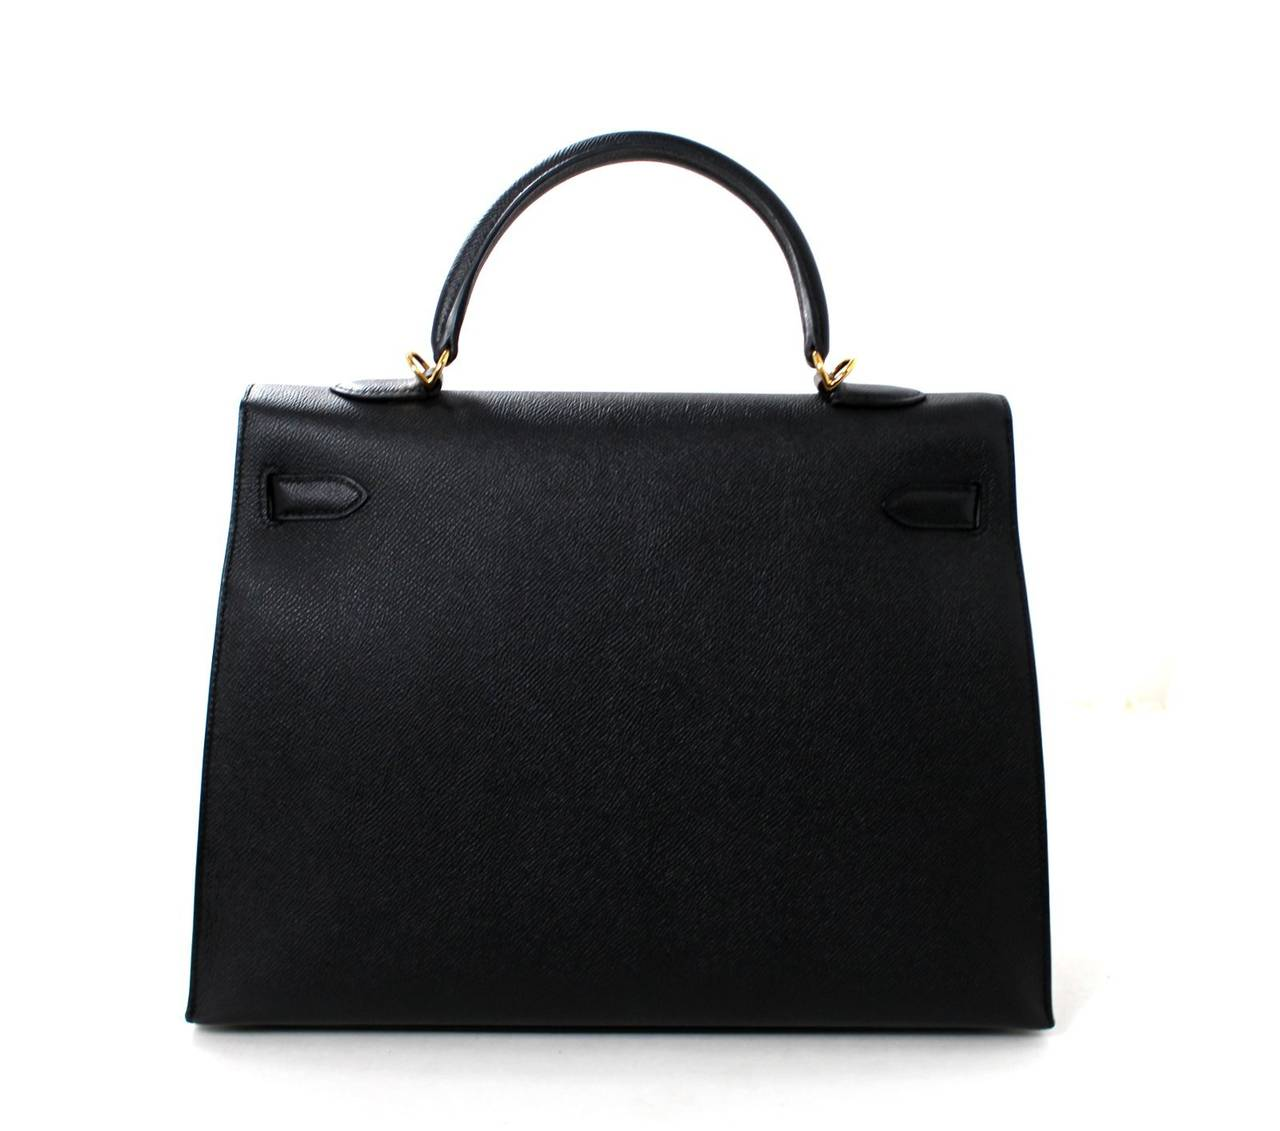 Hermes Black Kelly Sellier- Epsom Leather GHW  in 35 cm size 3